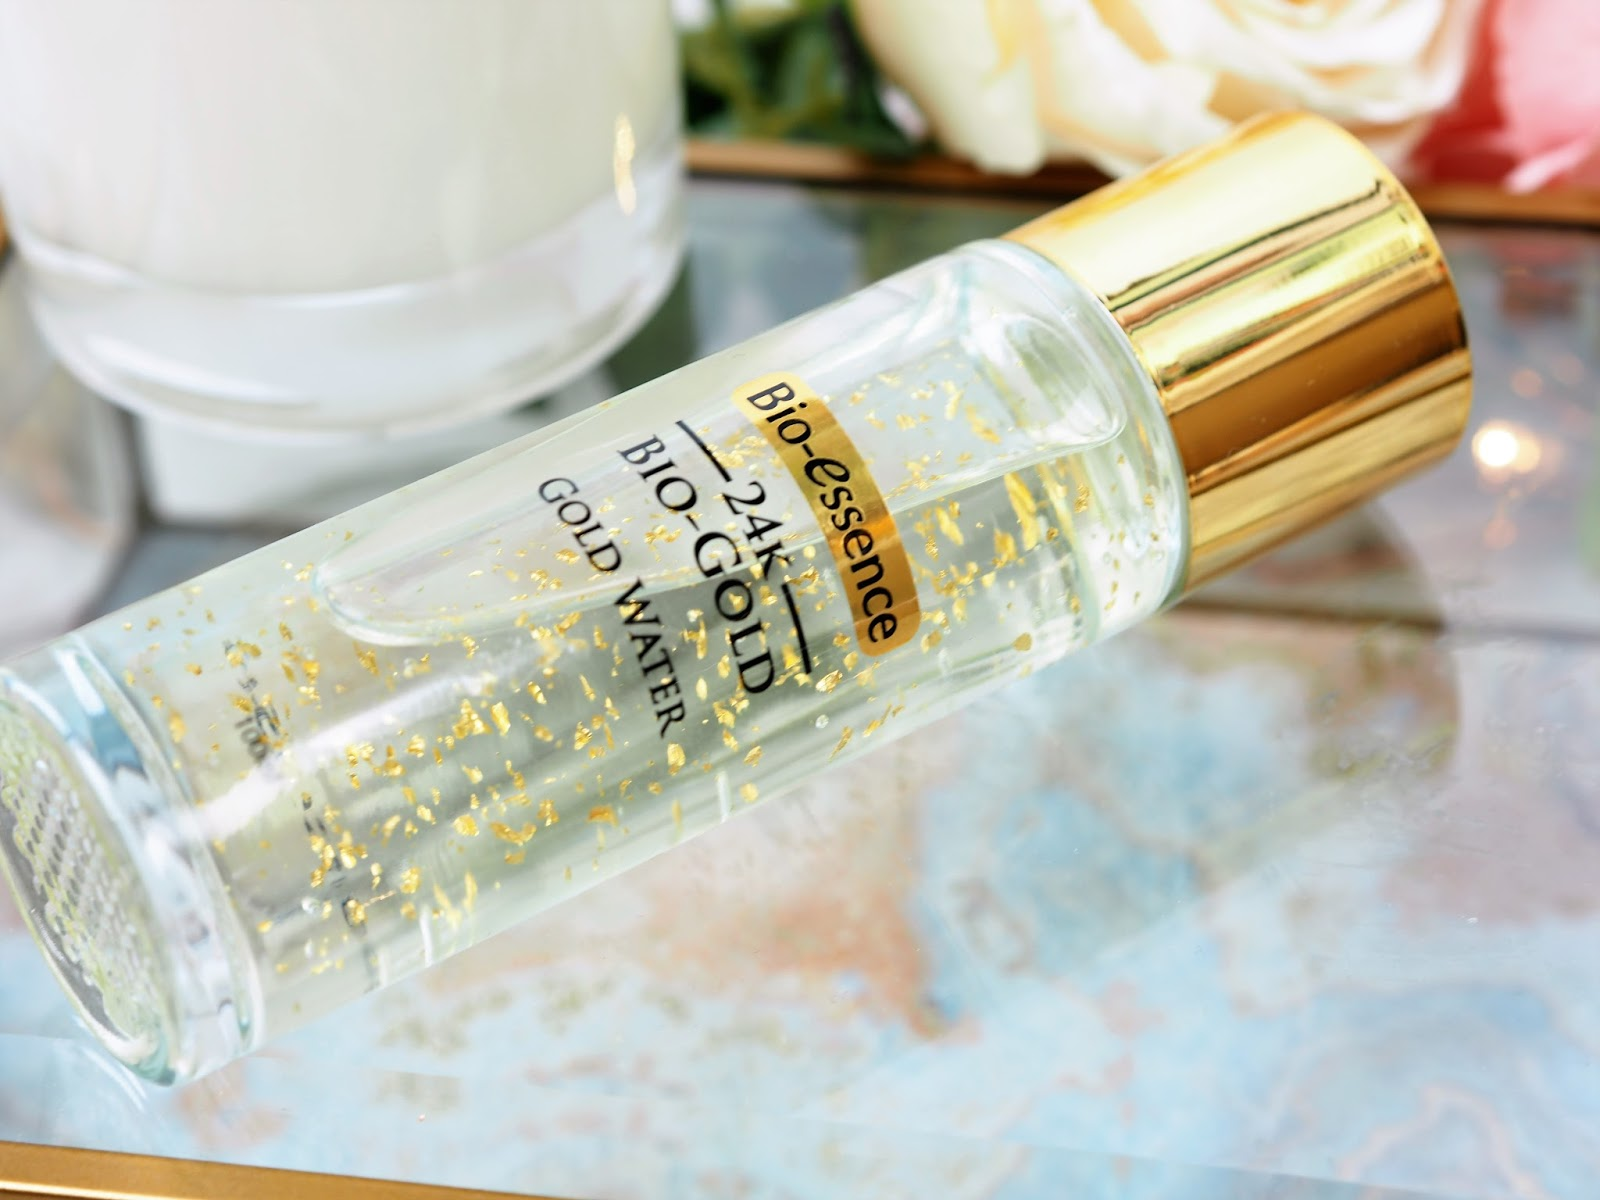 Bio-Essence 24k Gold Water